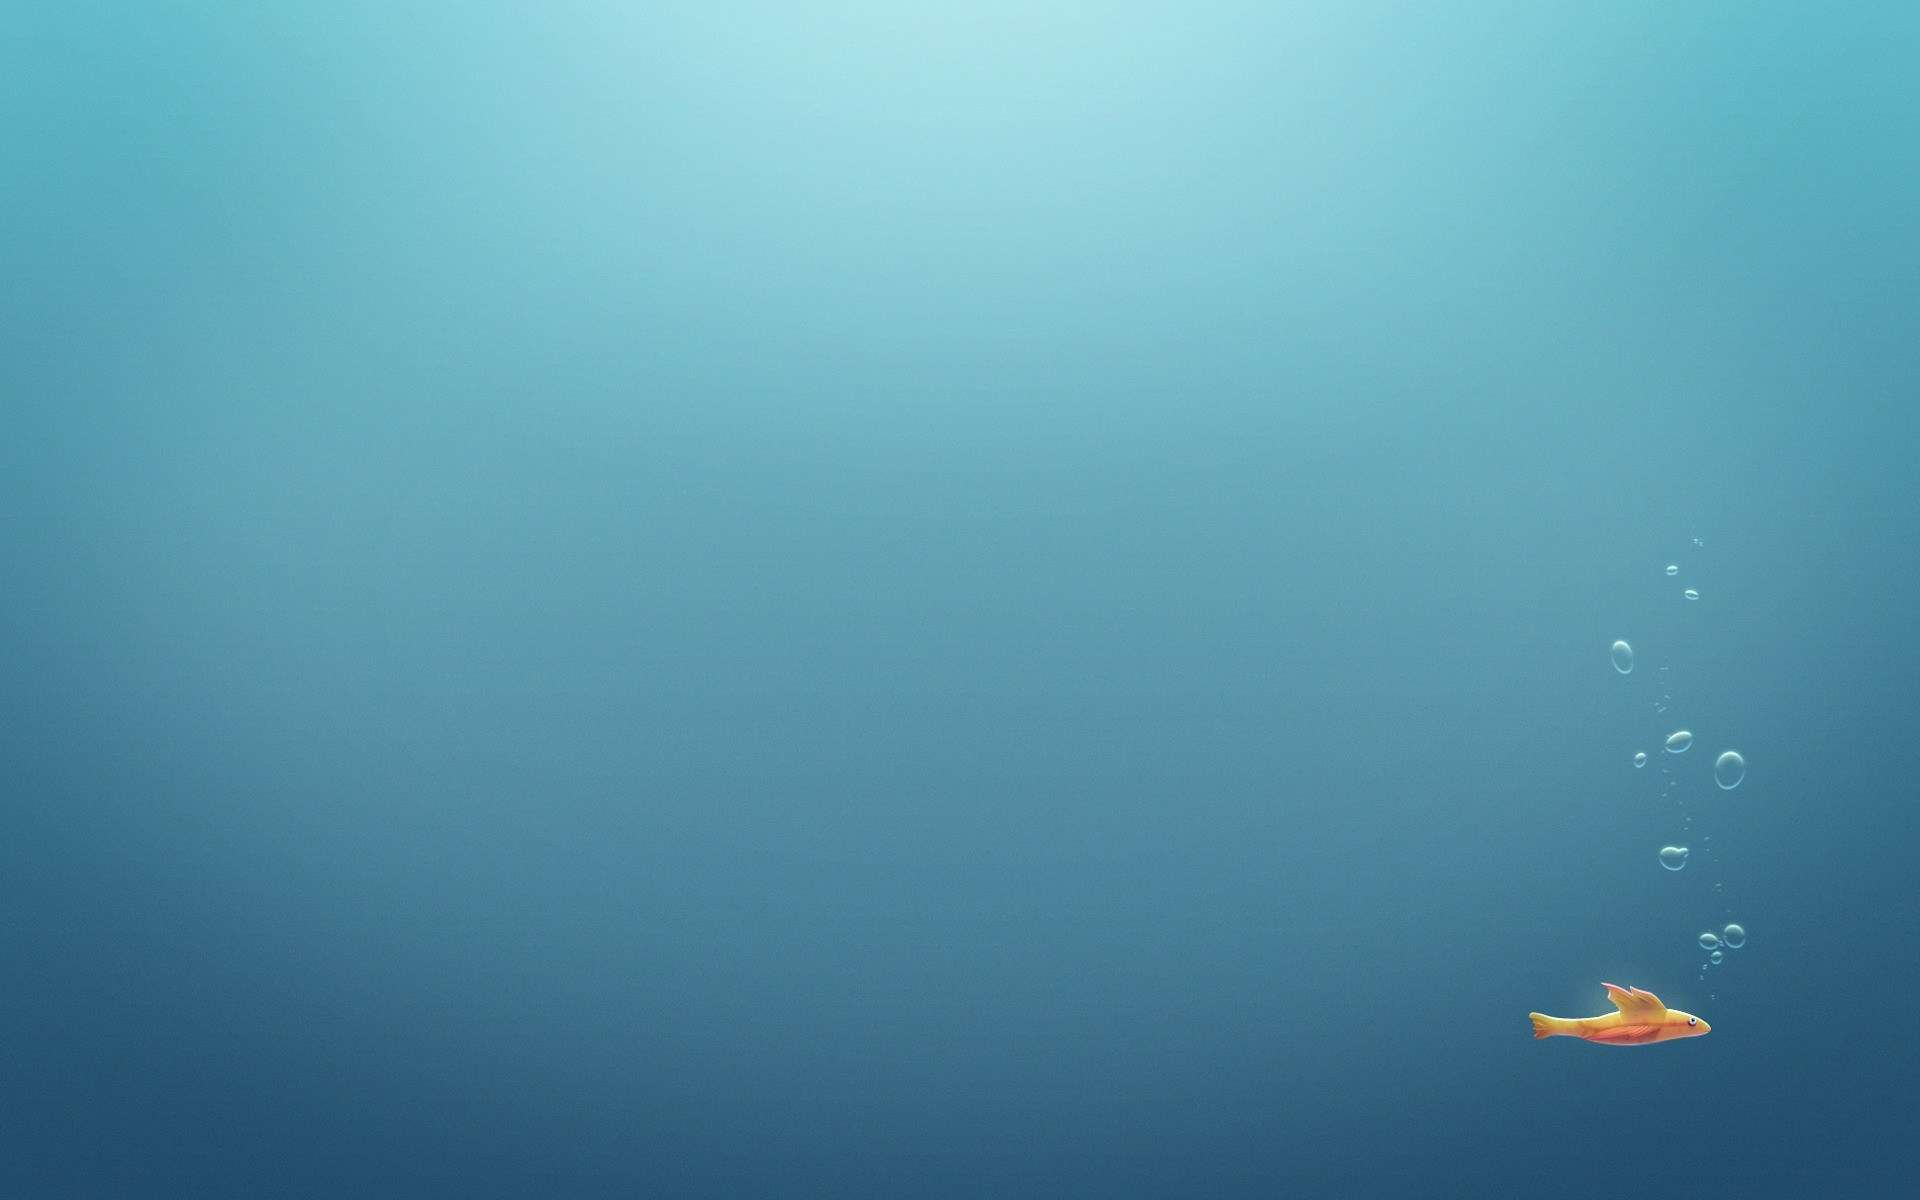 Fish Wallpaper 043